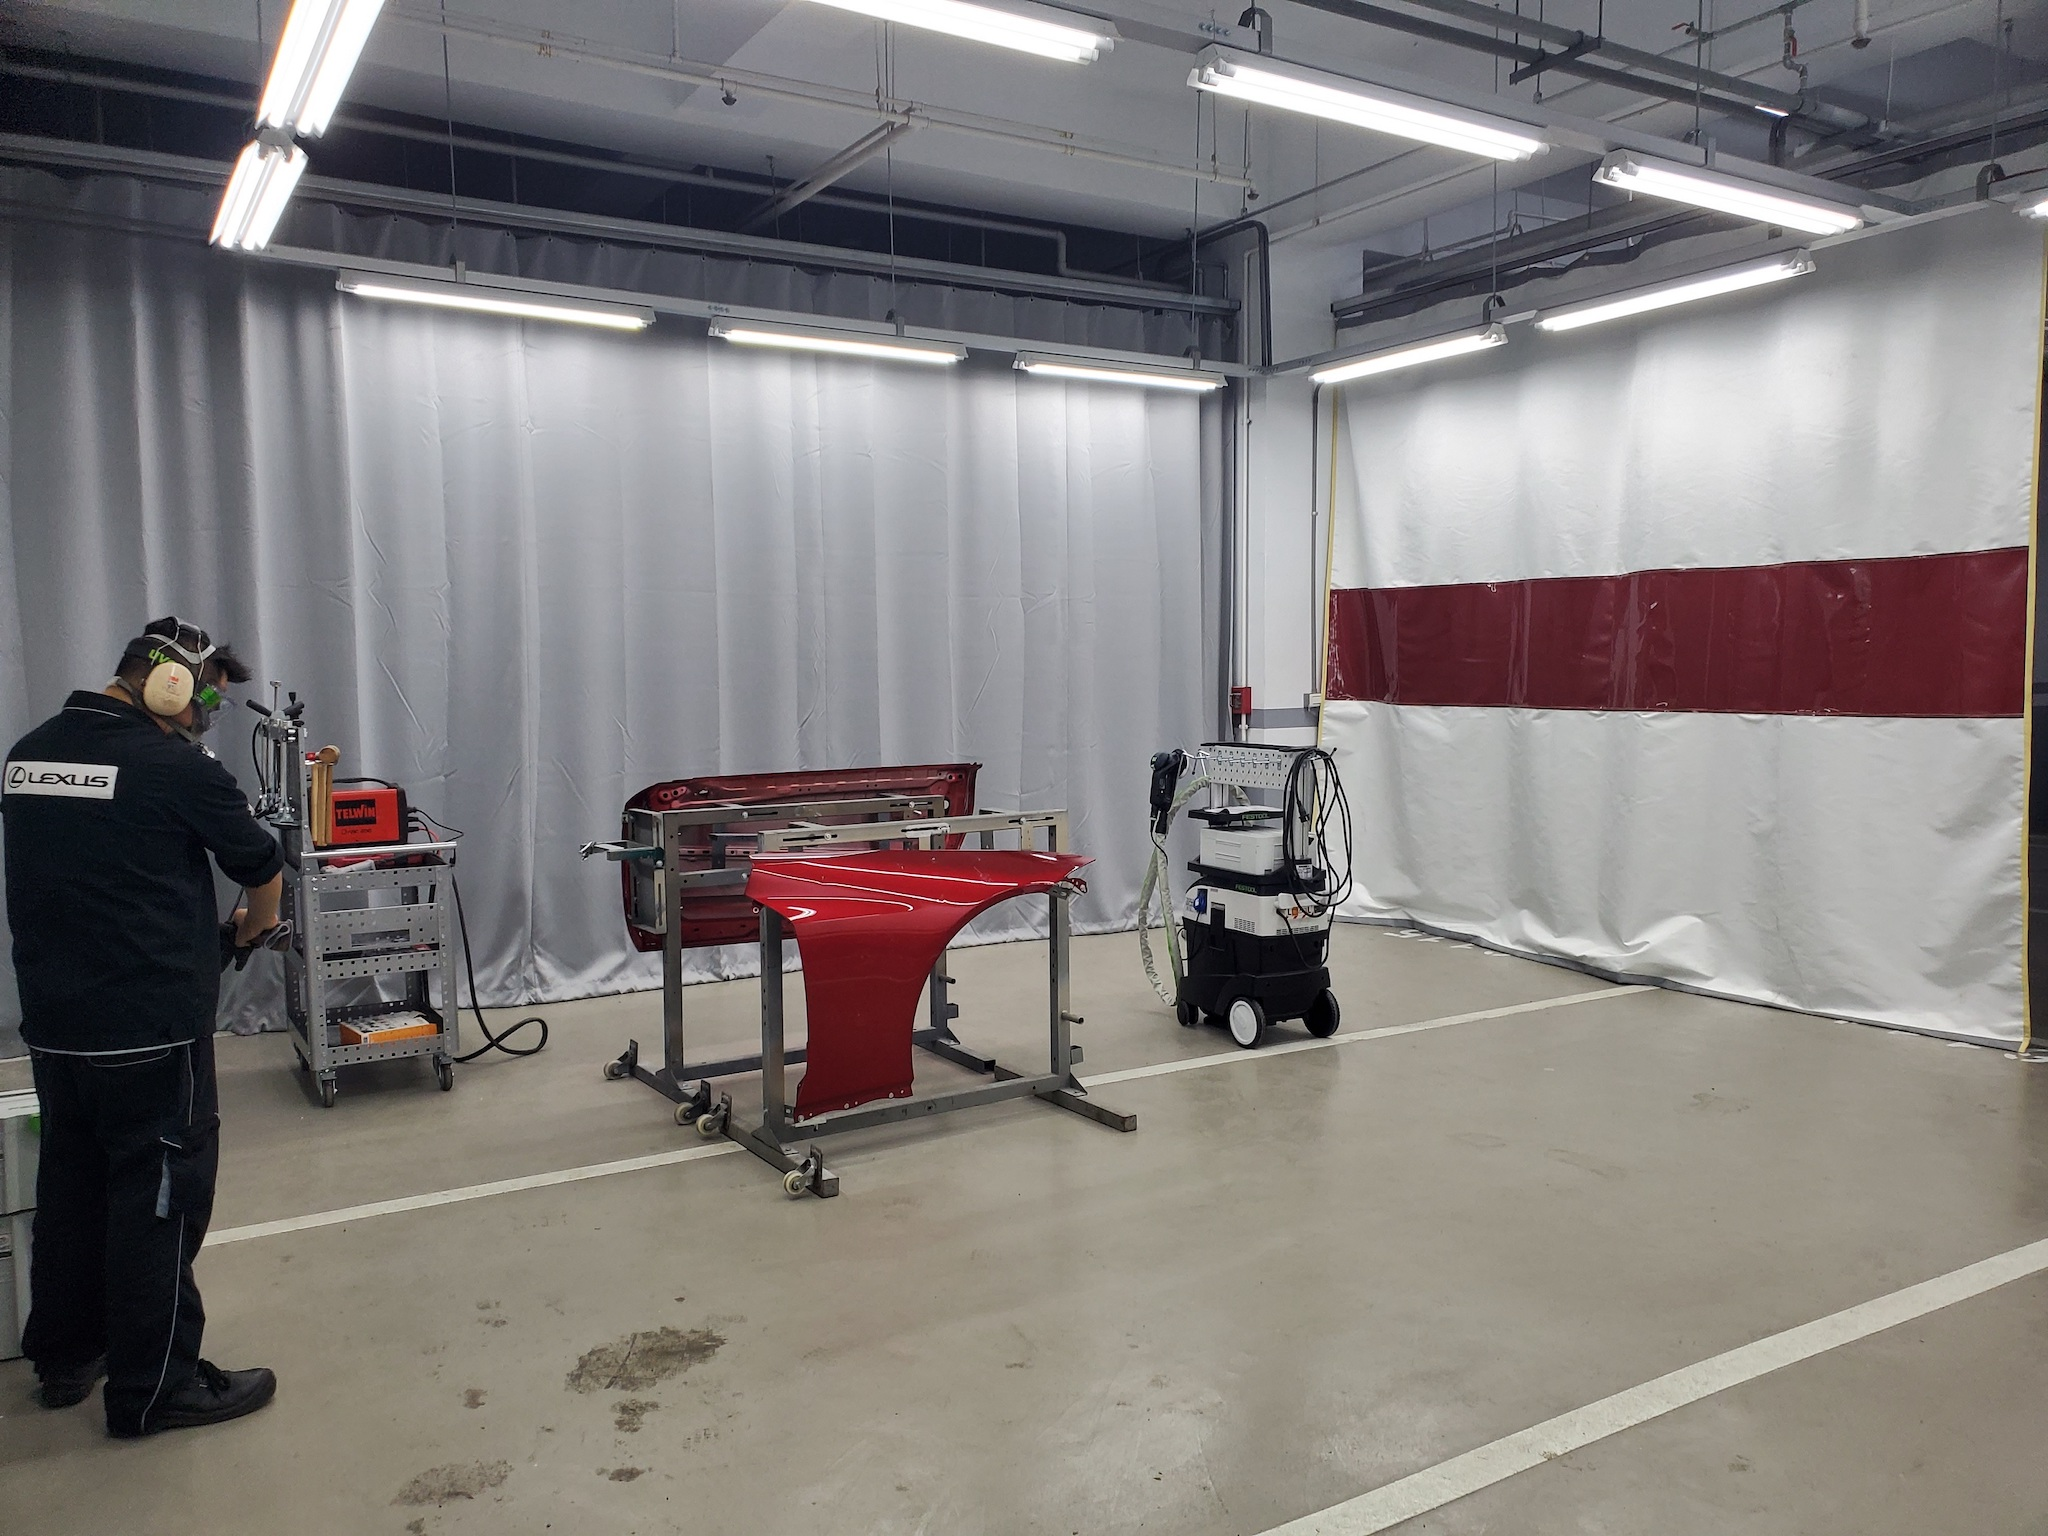 Lexus 特別設置鋁合金獨立維修區域,不僅具防火隔簾,並引進國外知名專修工具及個人防護設備。